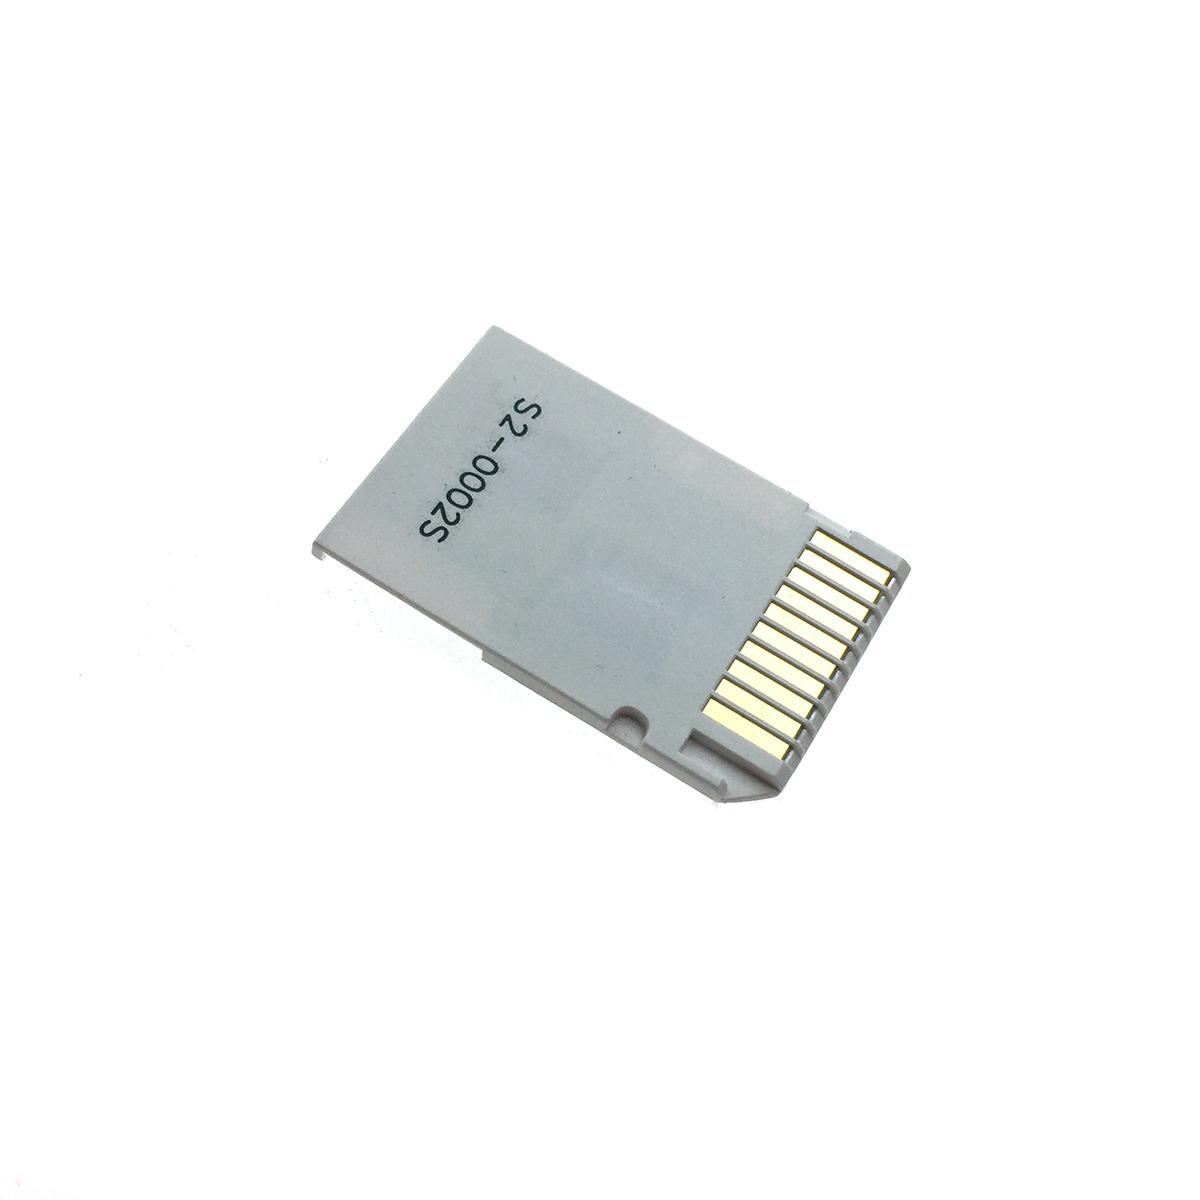 Переходник - адаптер 2 MicroSD в Memory Stick PRO Duo, Espada E-2mSDMSDUO